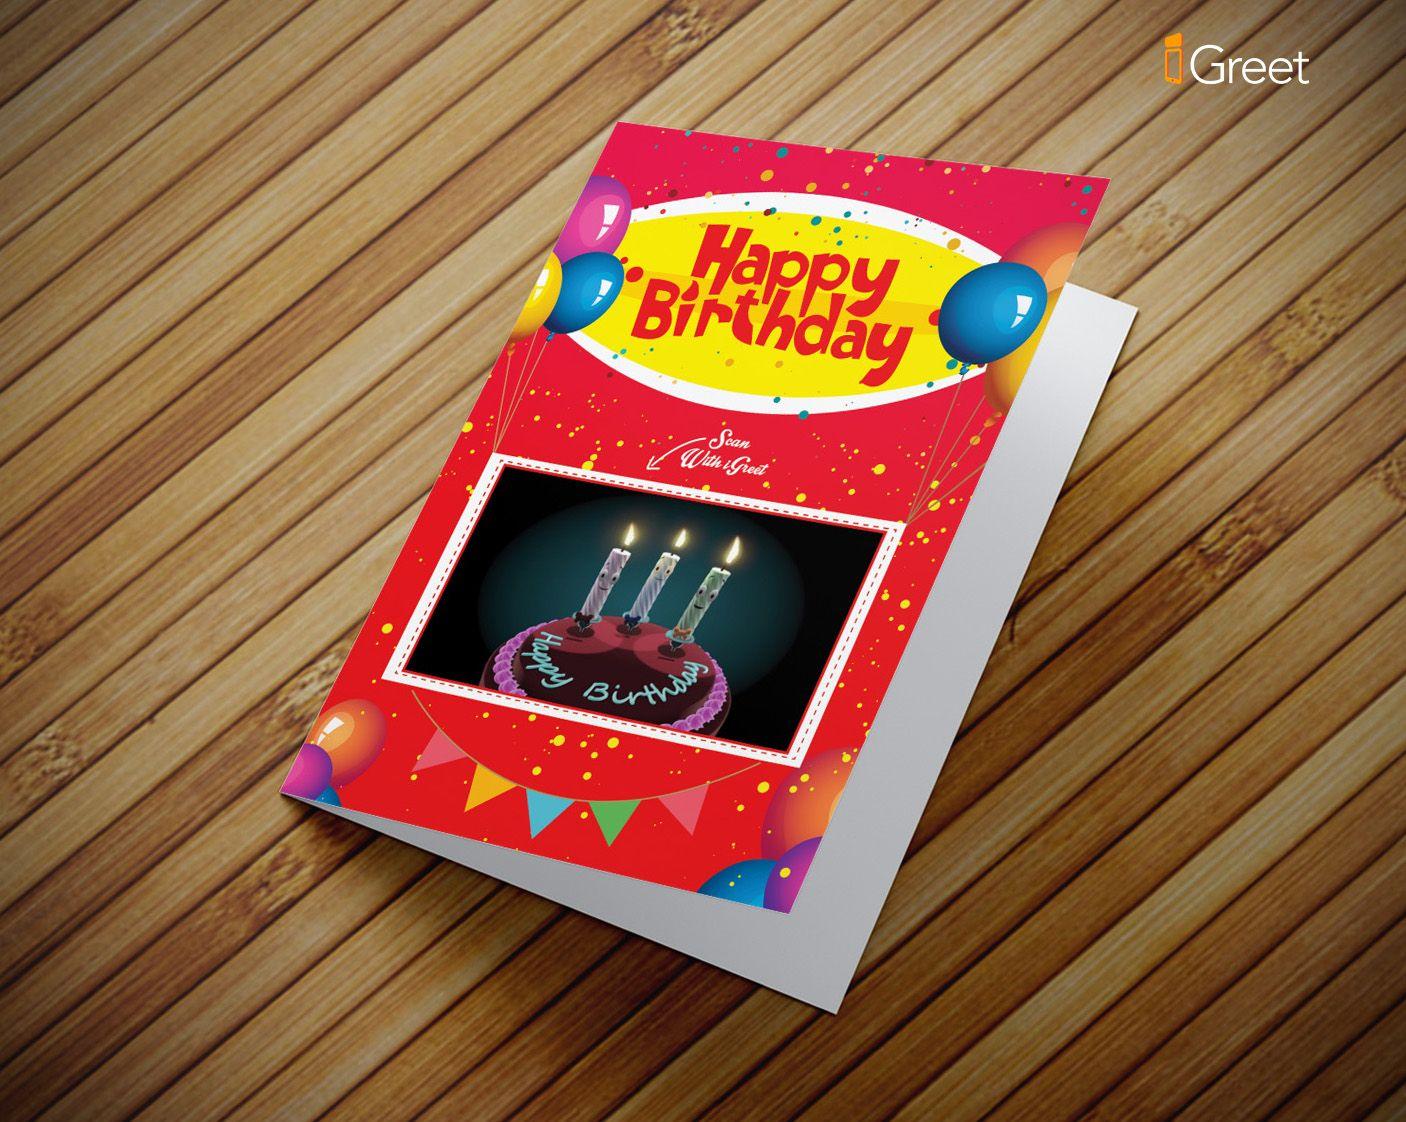 happy birthday singing candles greeting card